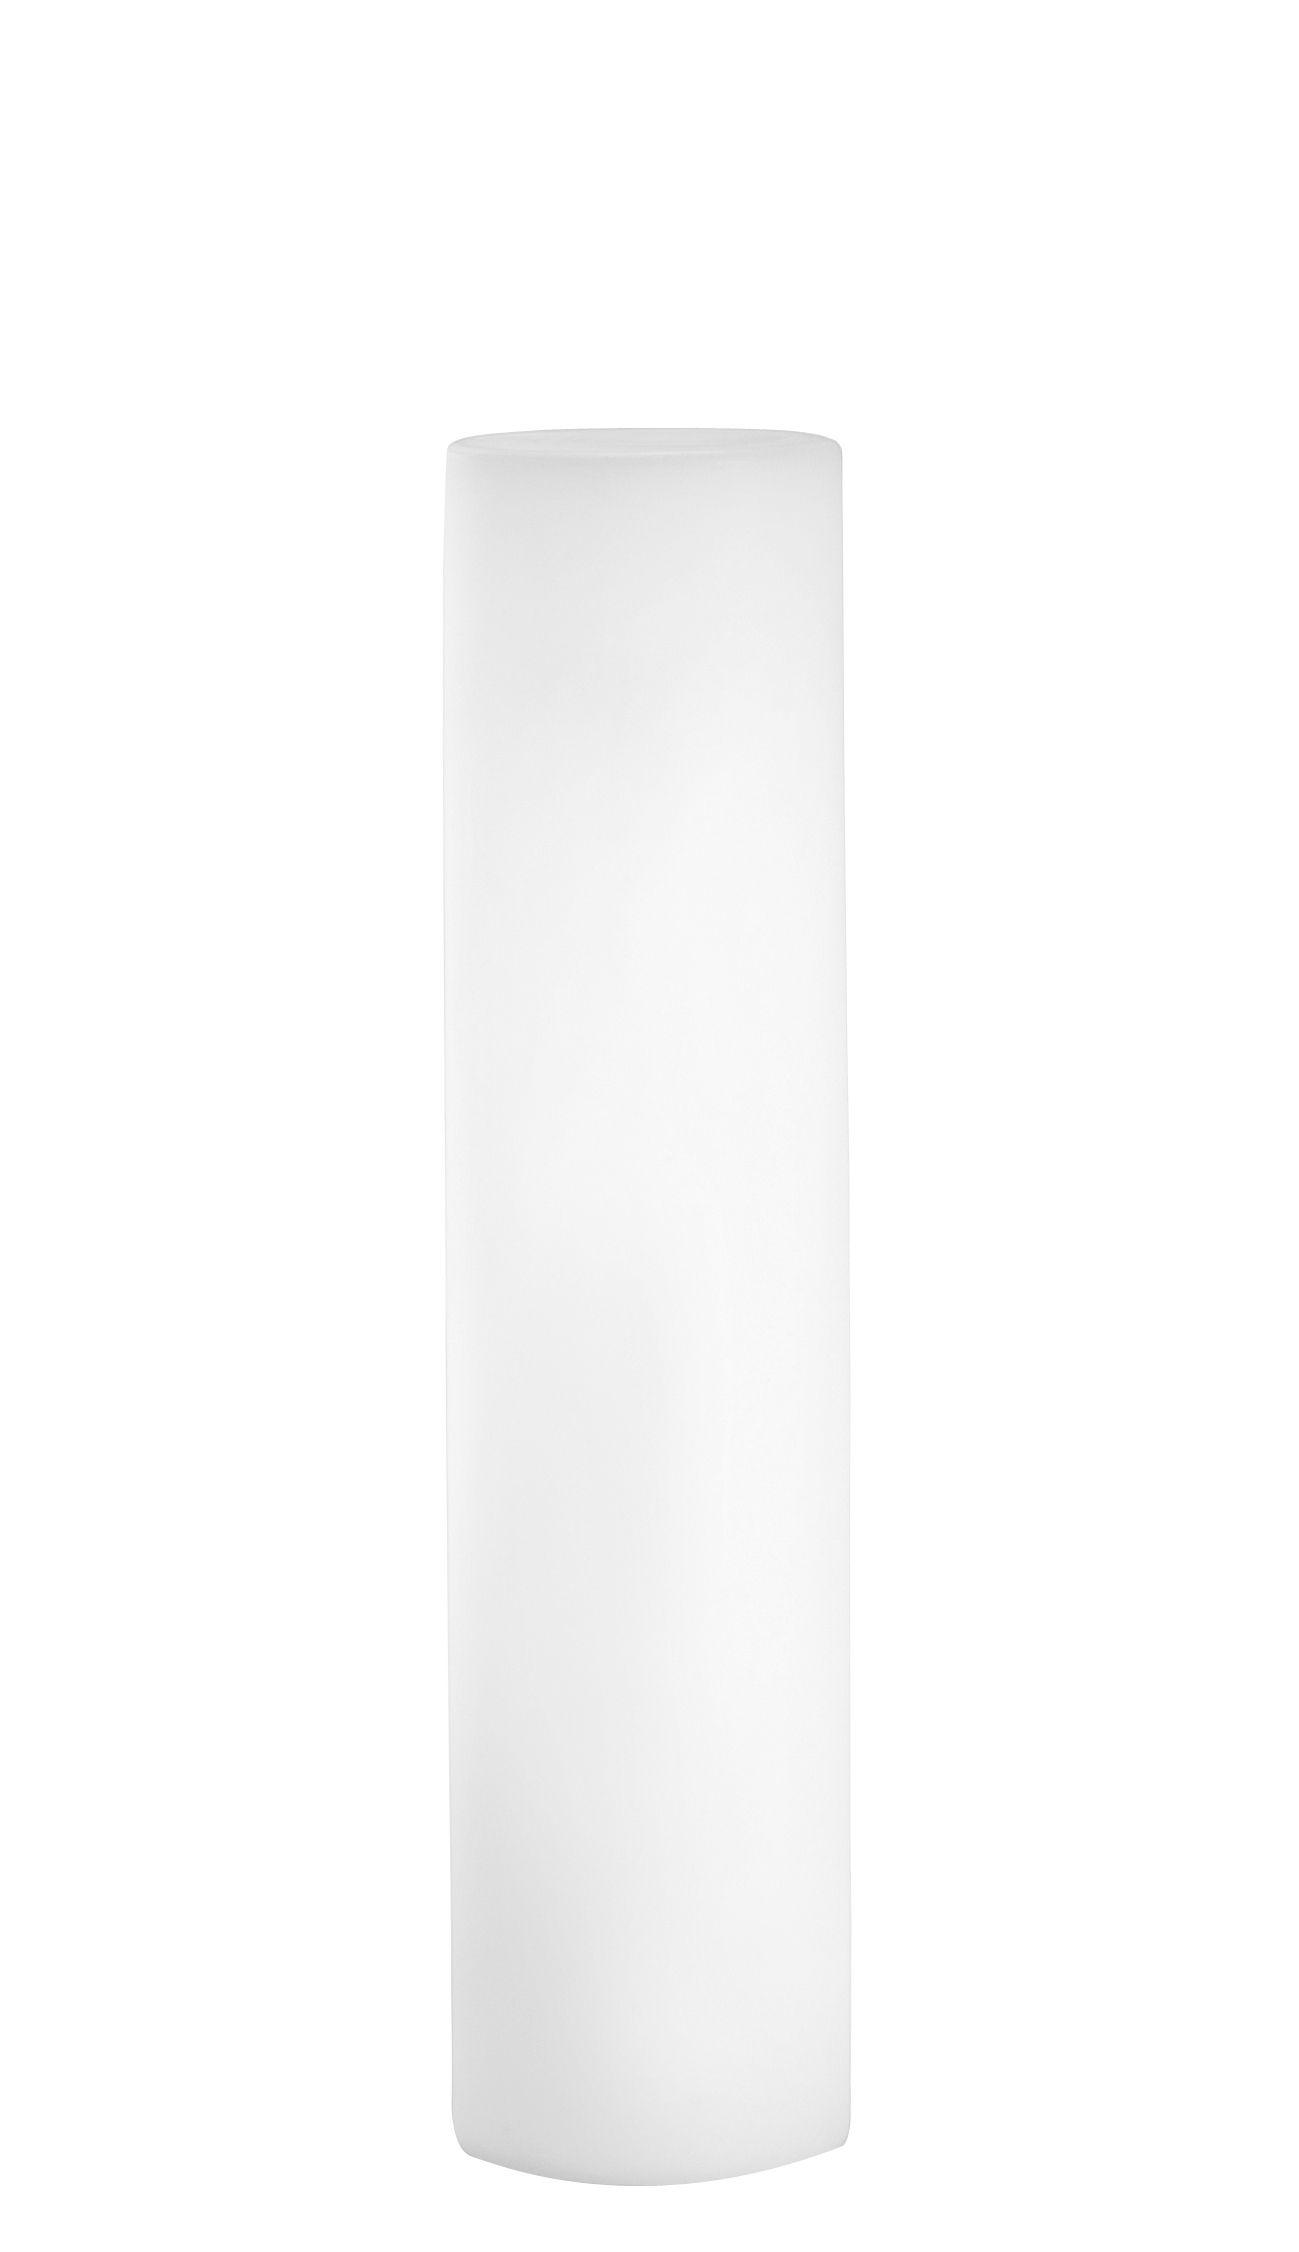 Lighting - Floor lamps - Fluo Floor lamp by Slide - White - recyclable polyethylene